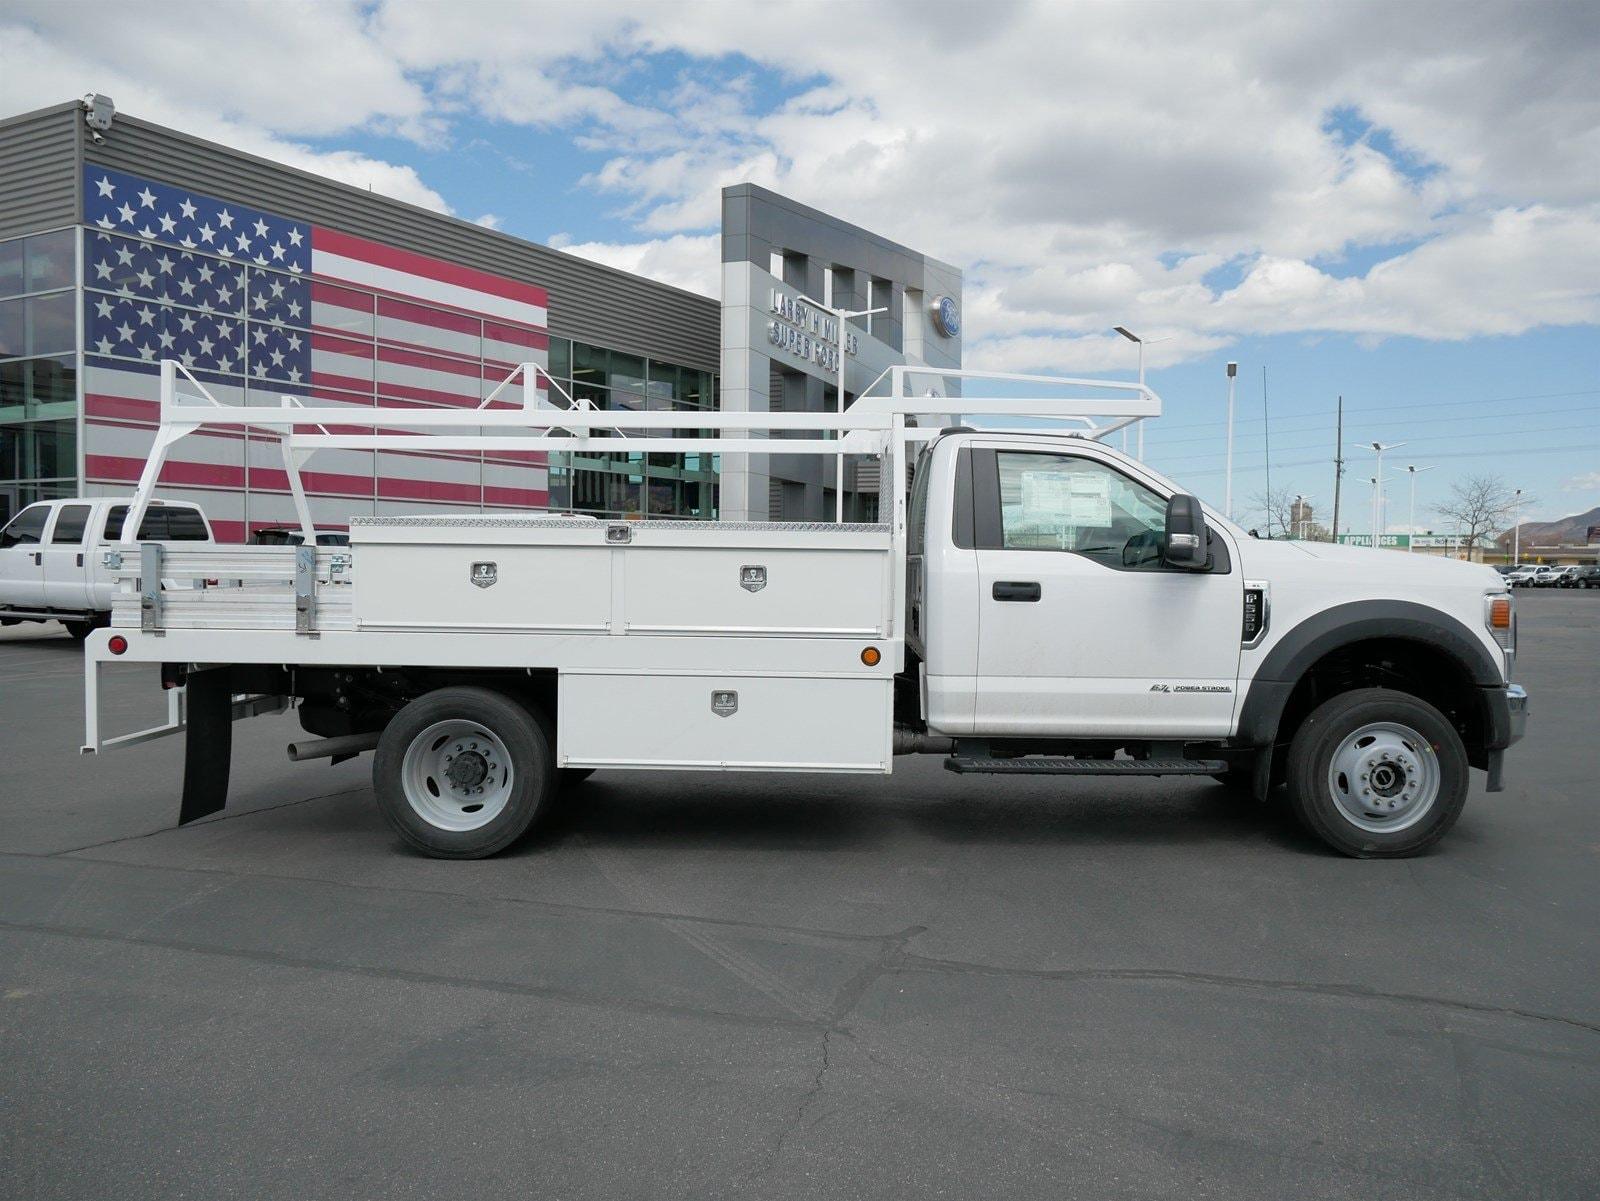 2020 F-550 Regular Cab DRW 4x4, Scelzi CTFB Contractor Body #63090 - photo 4